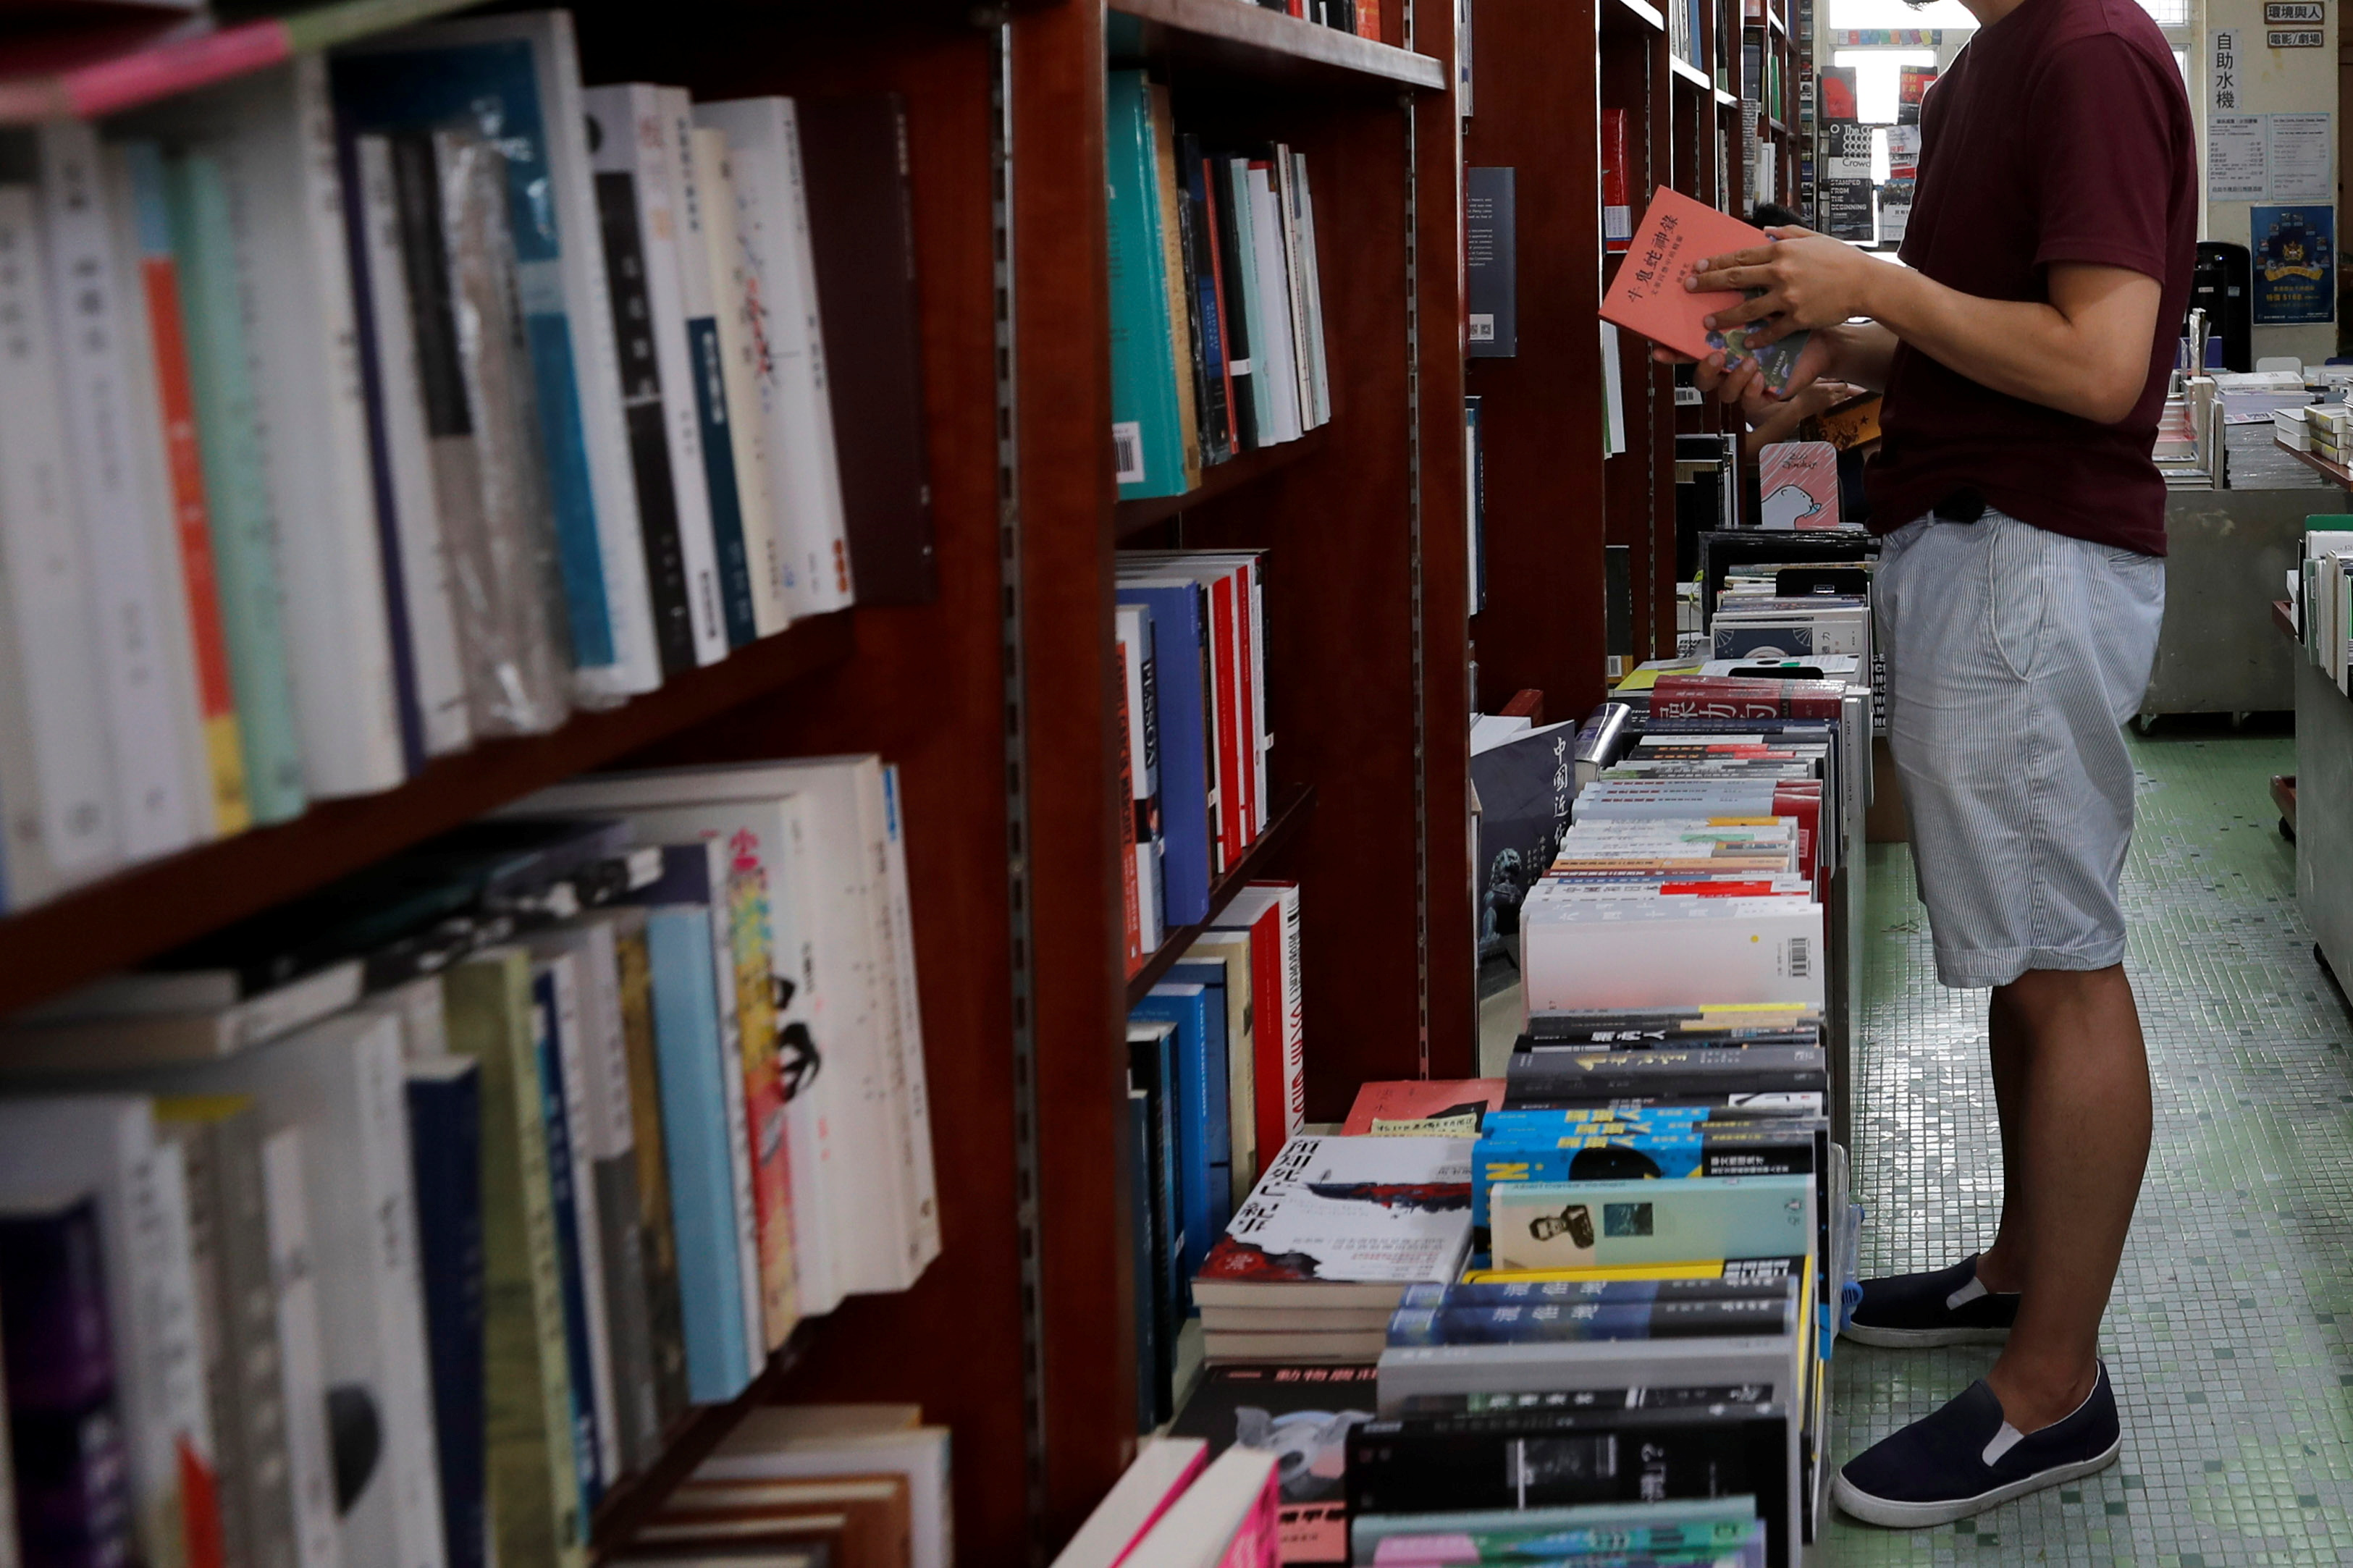 A man reads a book at independent bookstore